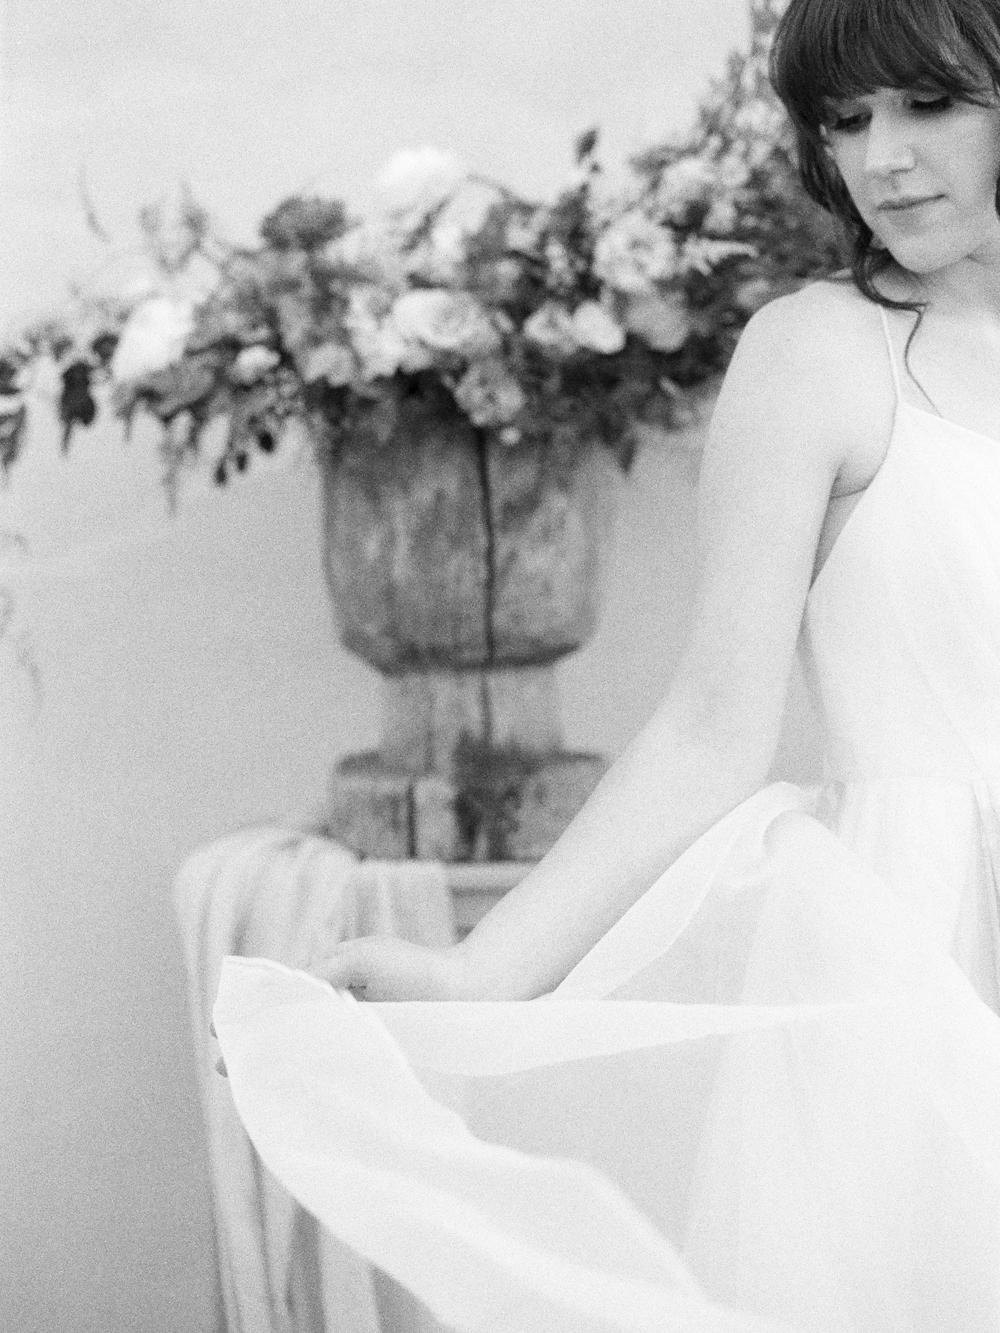 Christine Gosch_Houston wedding photographer_film photographer_fine art bride_lovely bride_ Houston, Texas_Montrose wedding photographer_www.christinegosch.com-1.jpg